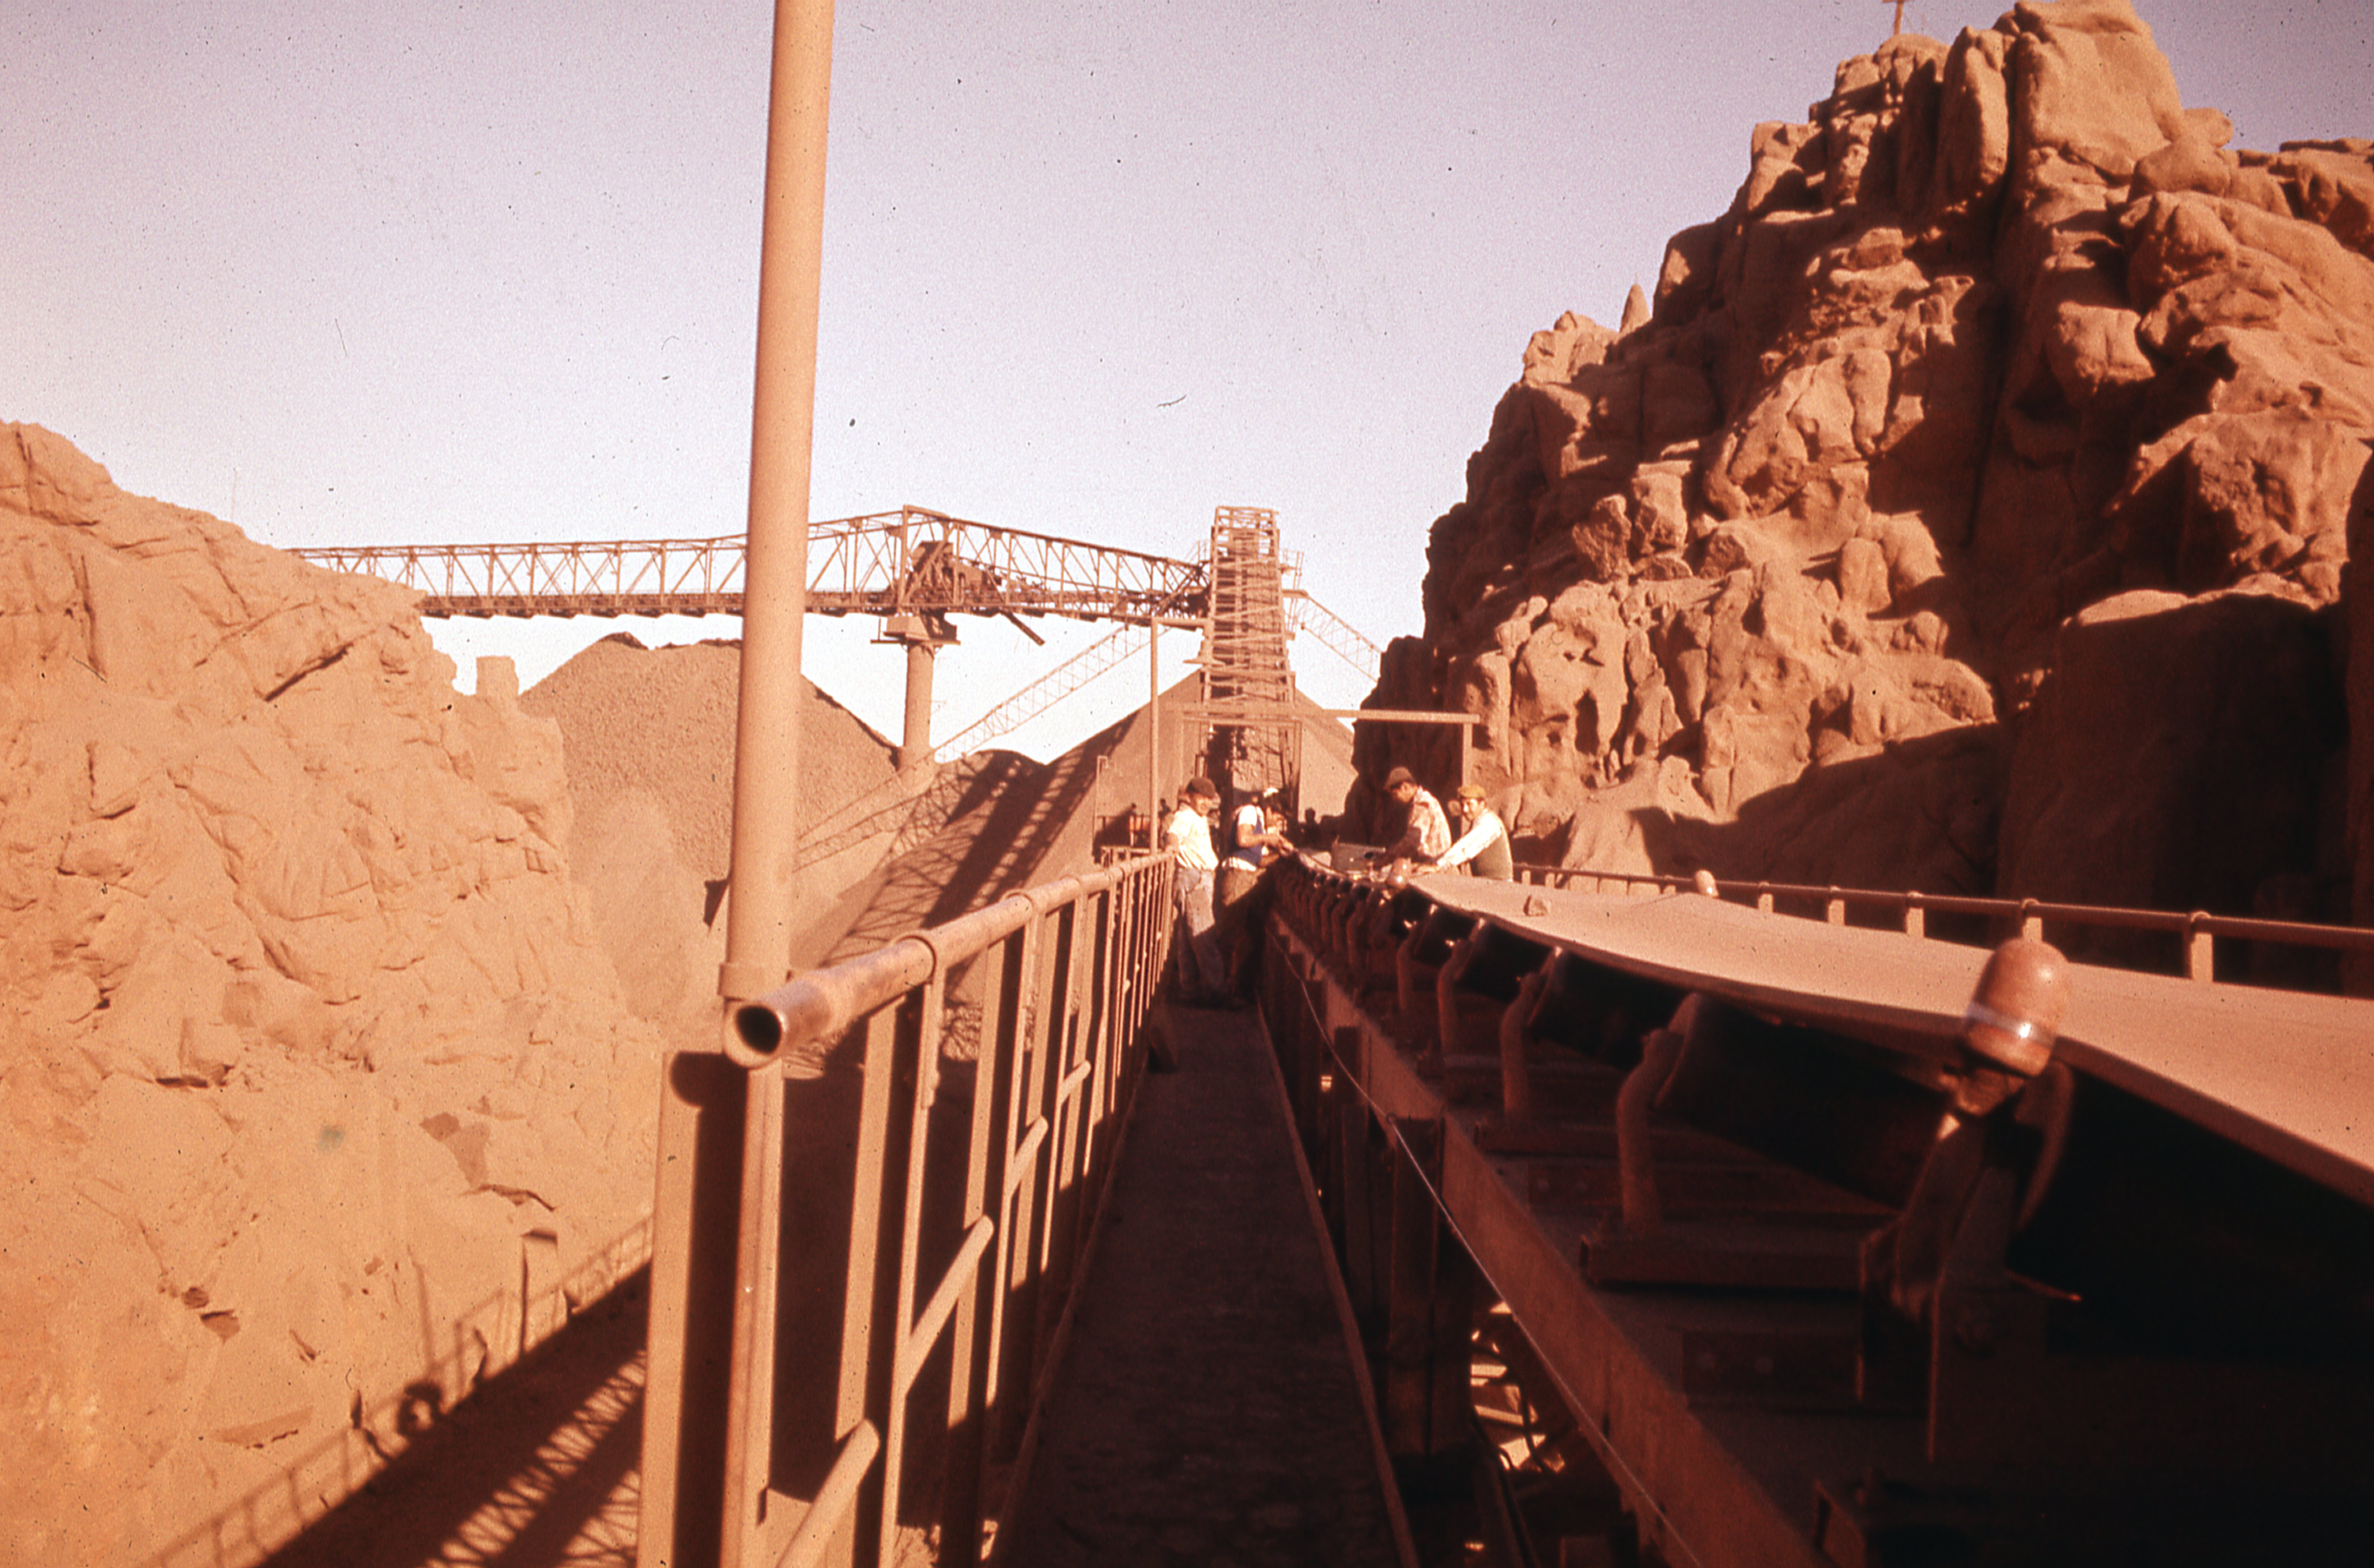 Enterreno - Fotos históricas de chile - fotos antiguas de Chile - Chañaral, 1977